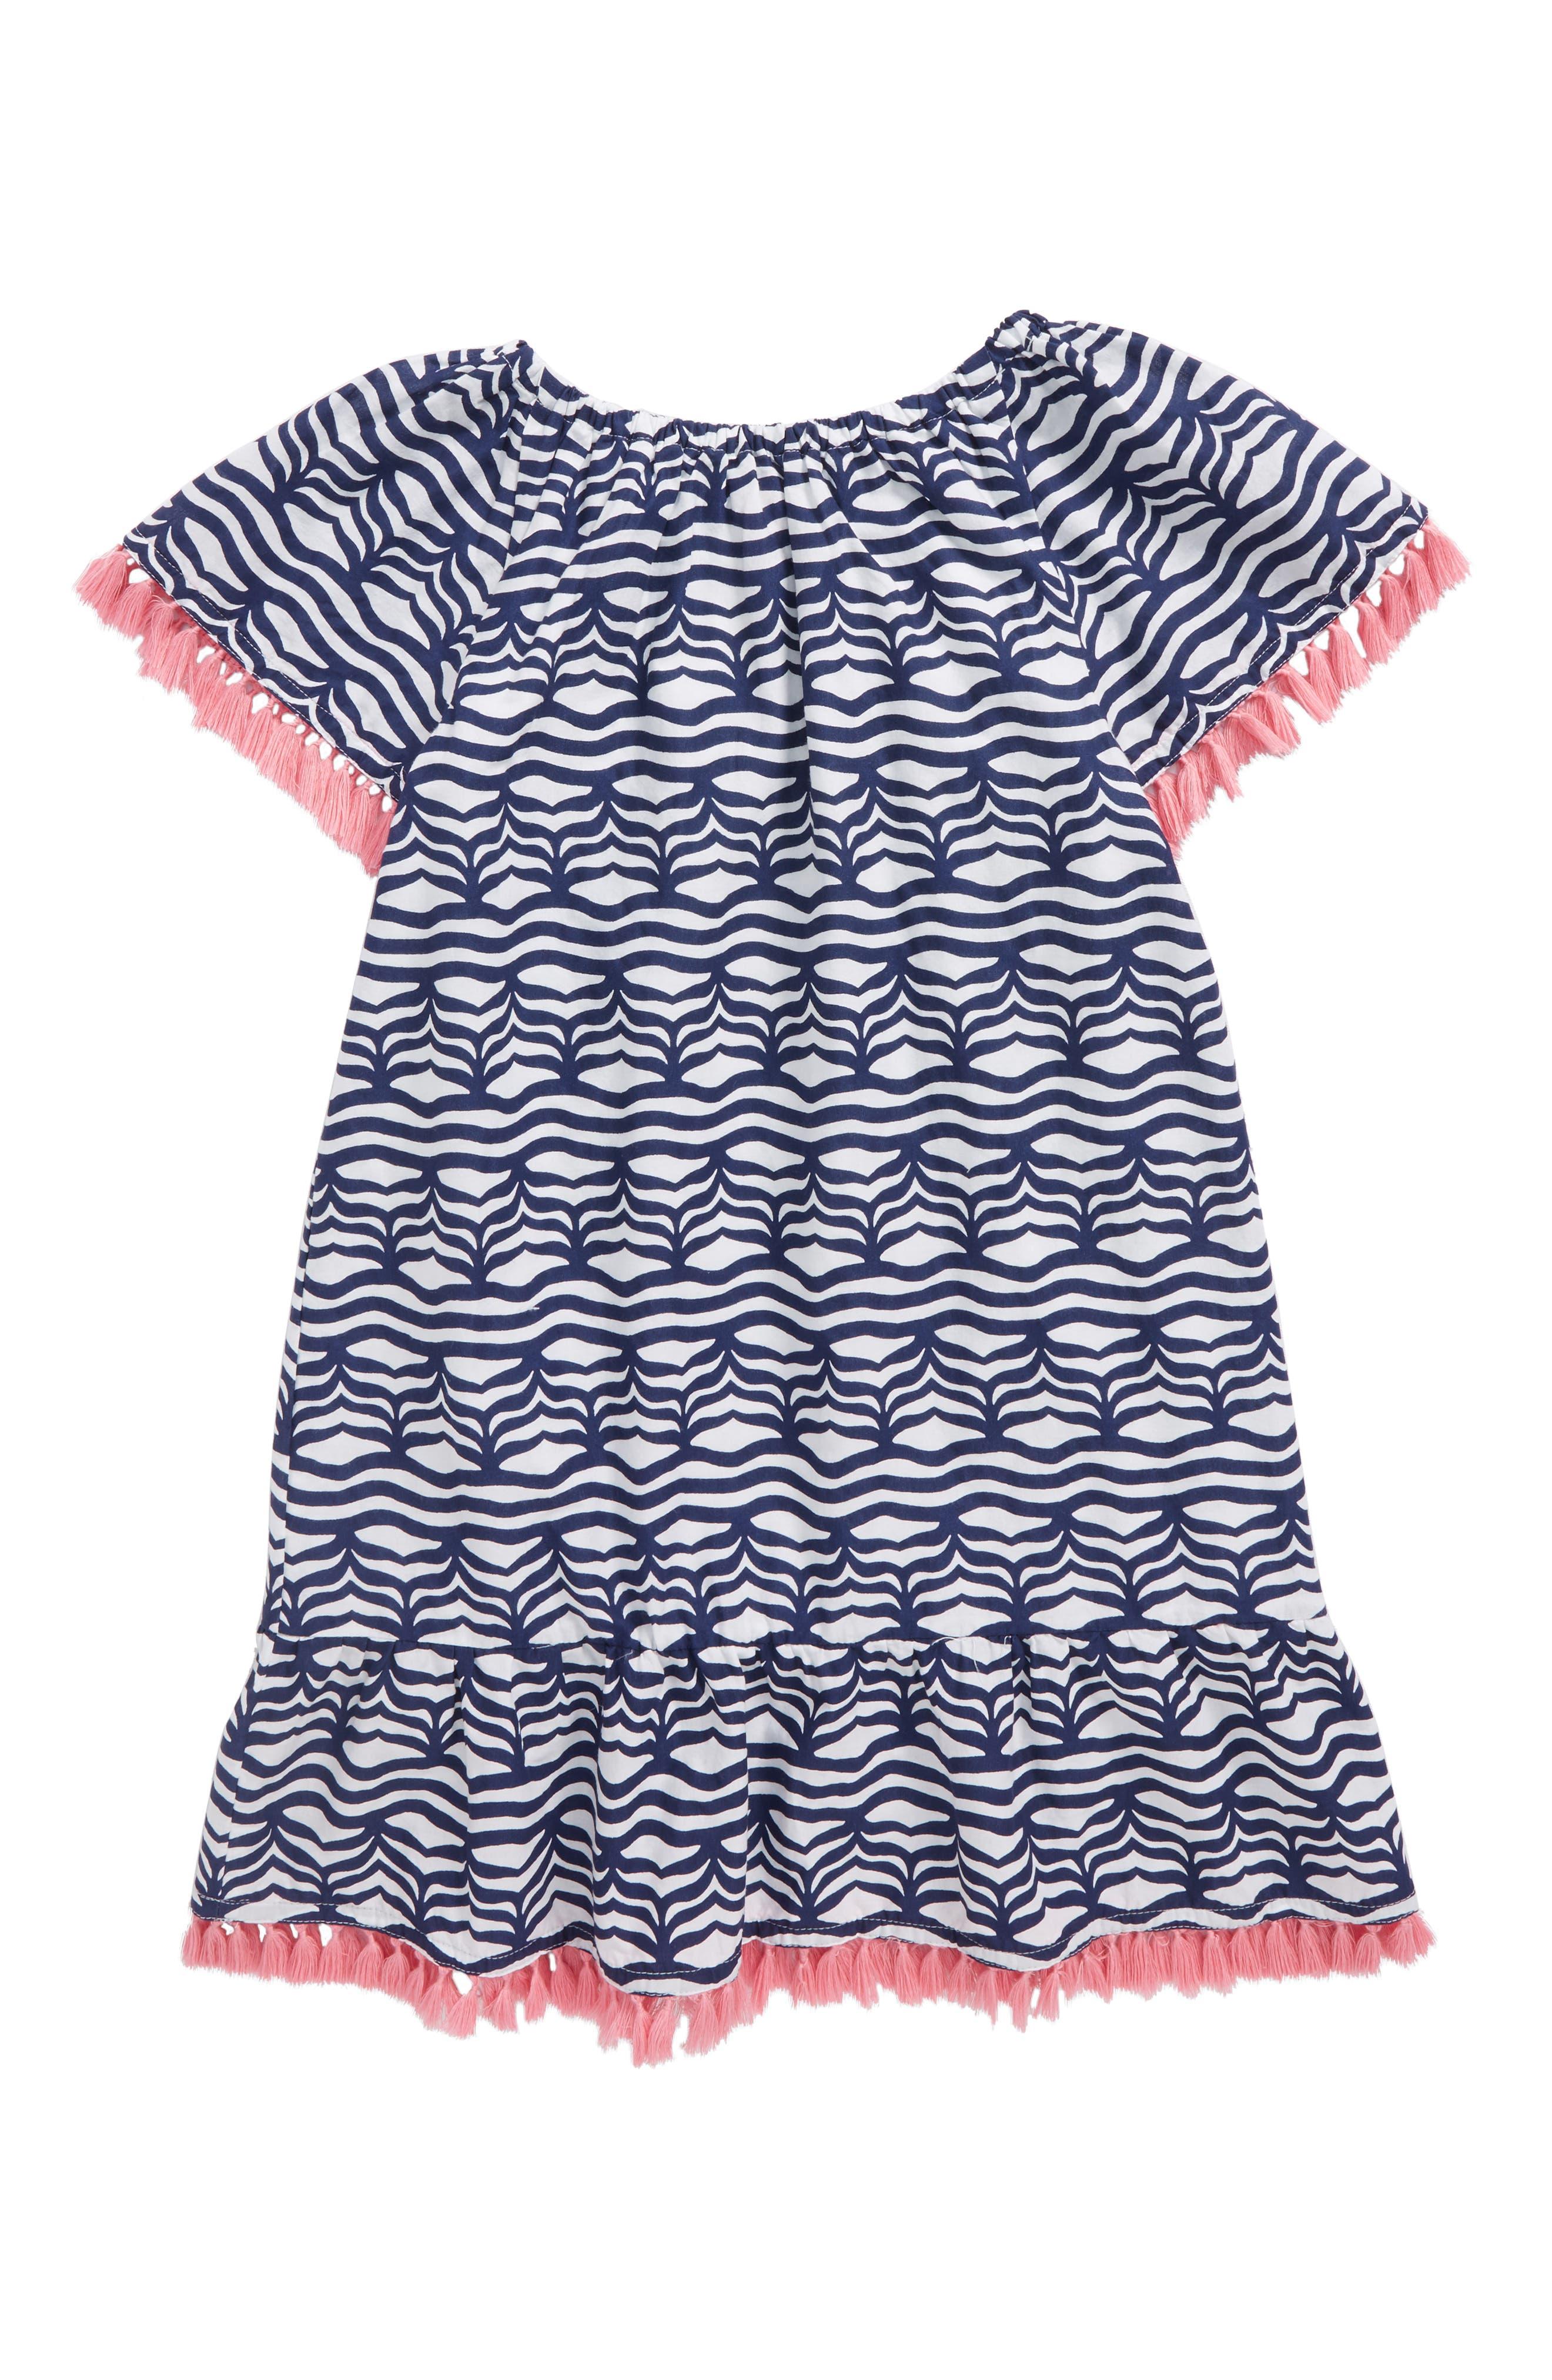 Whale Tail Wave Dress,                             Alternate thumbnail 2, color,                             400